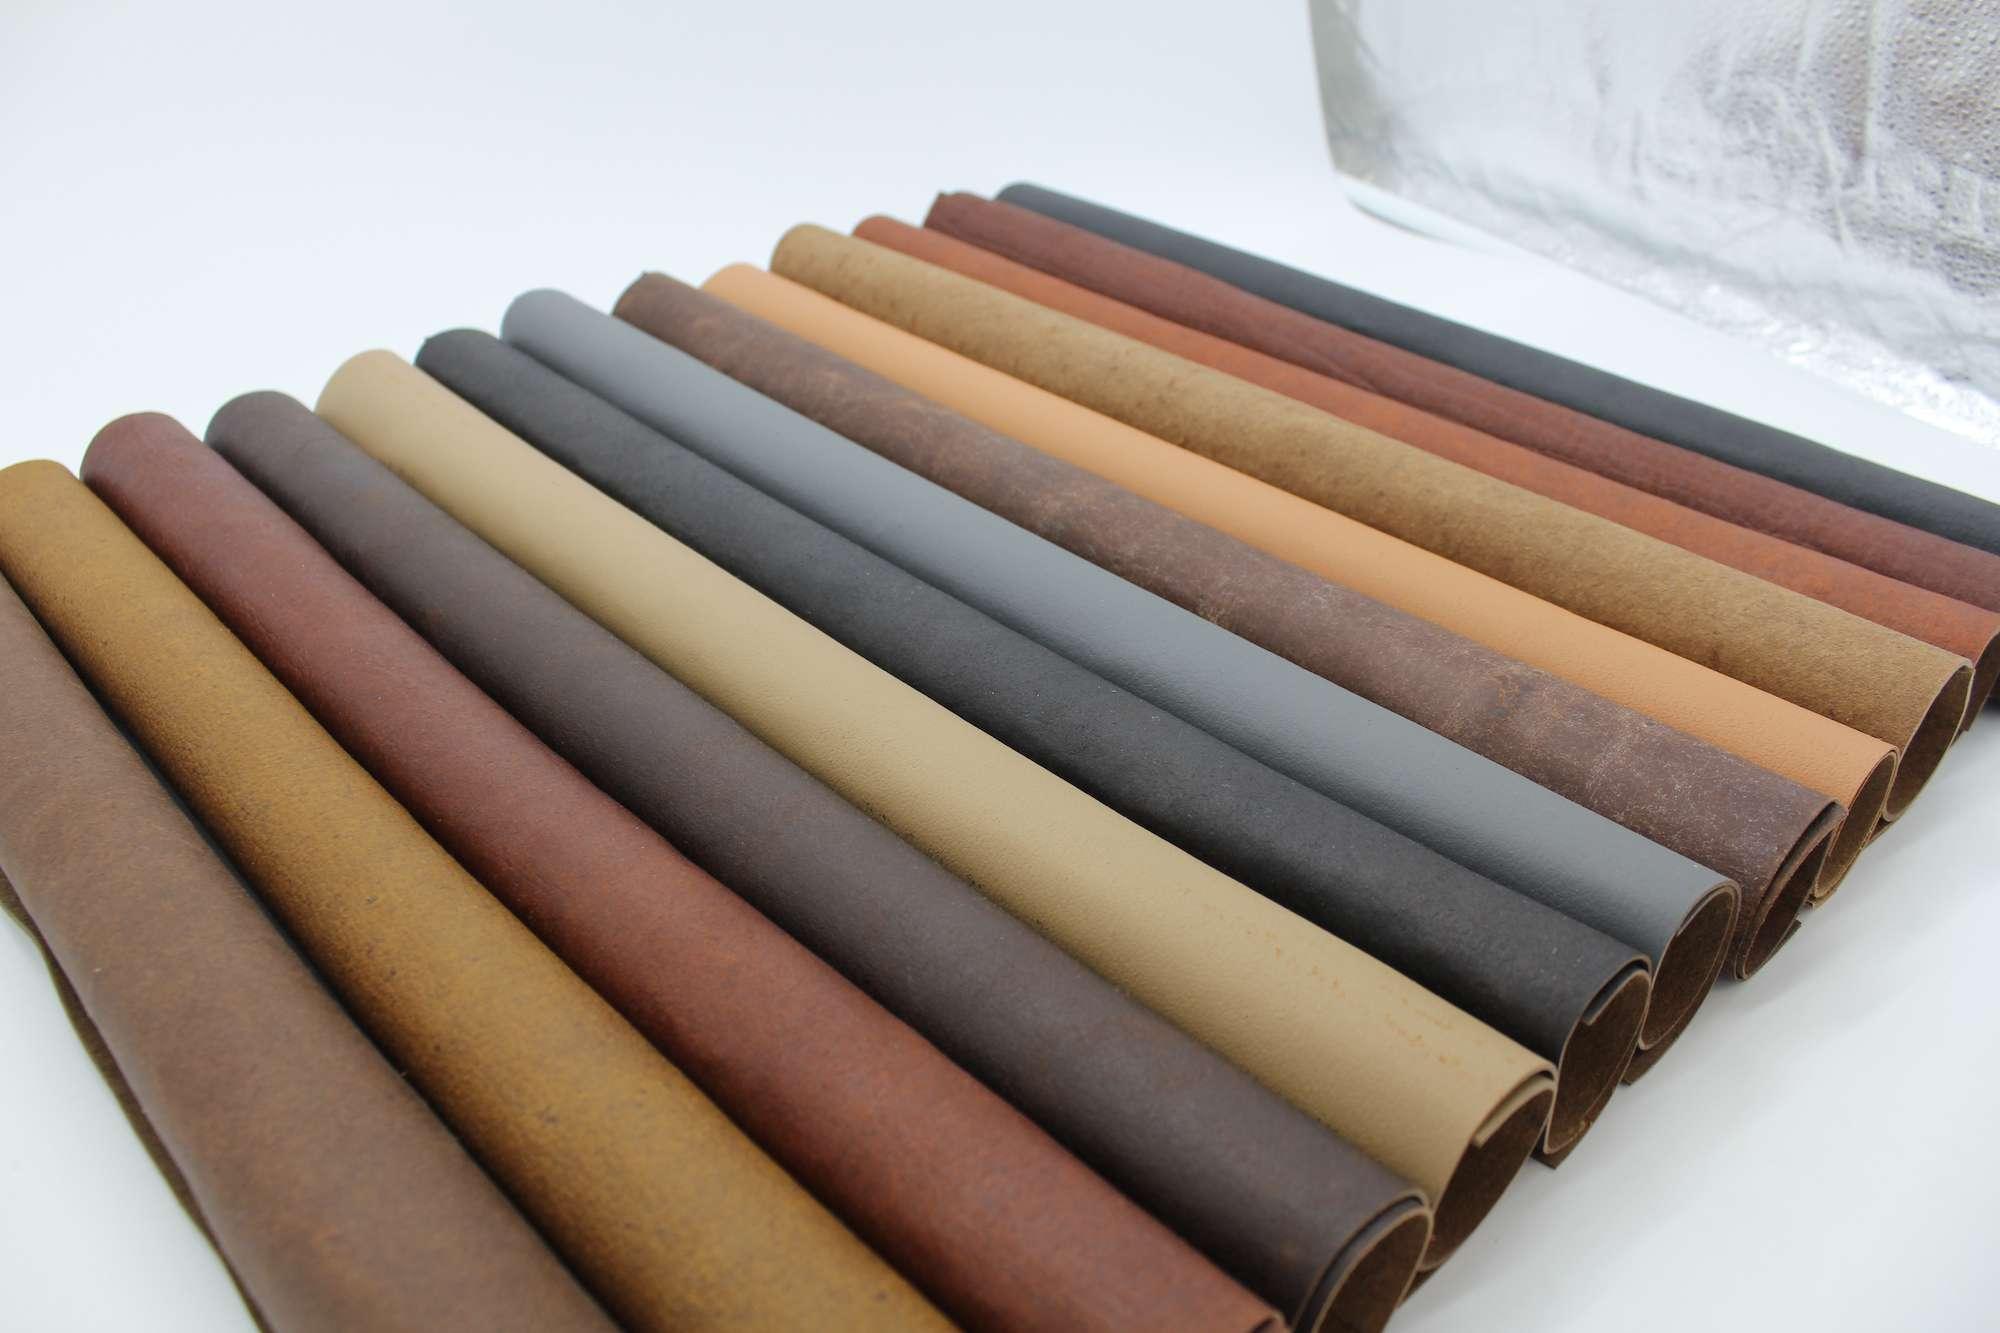 enspire leather rolls